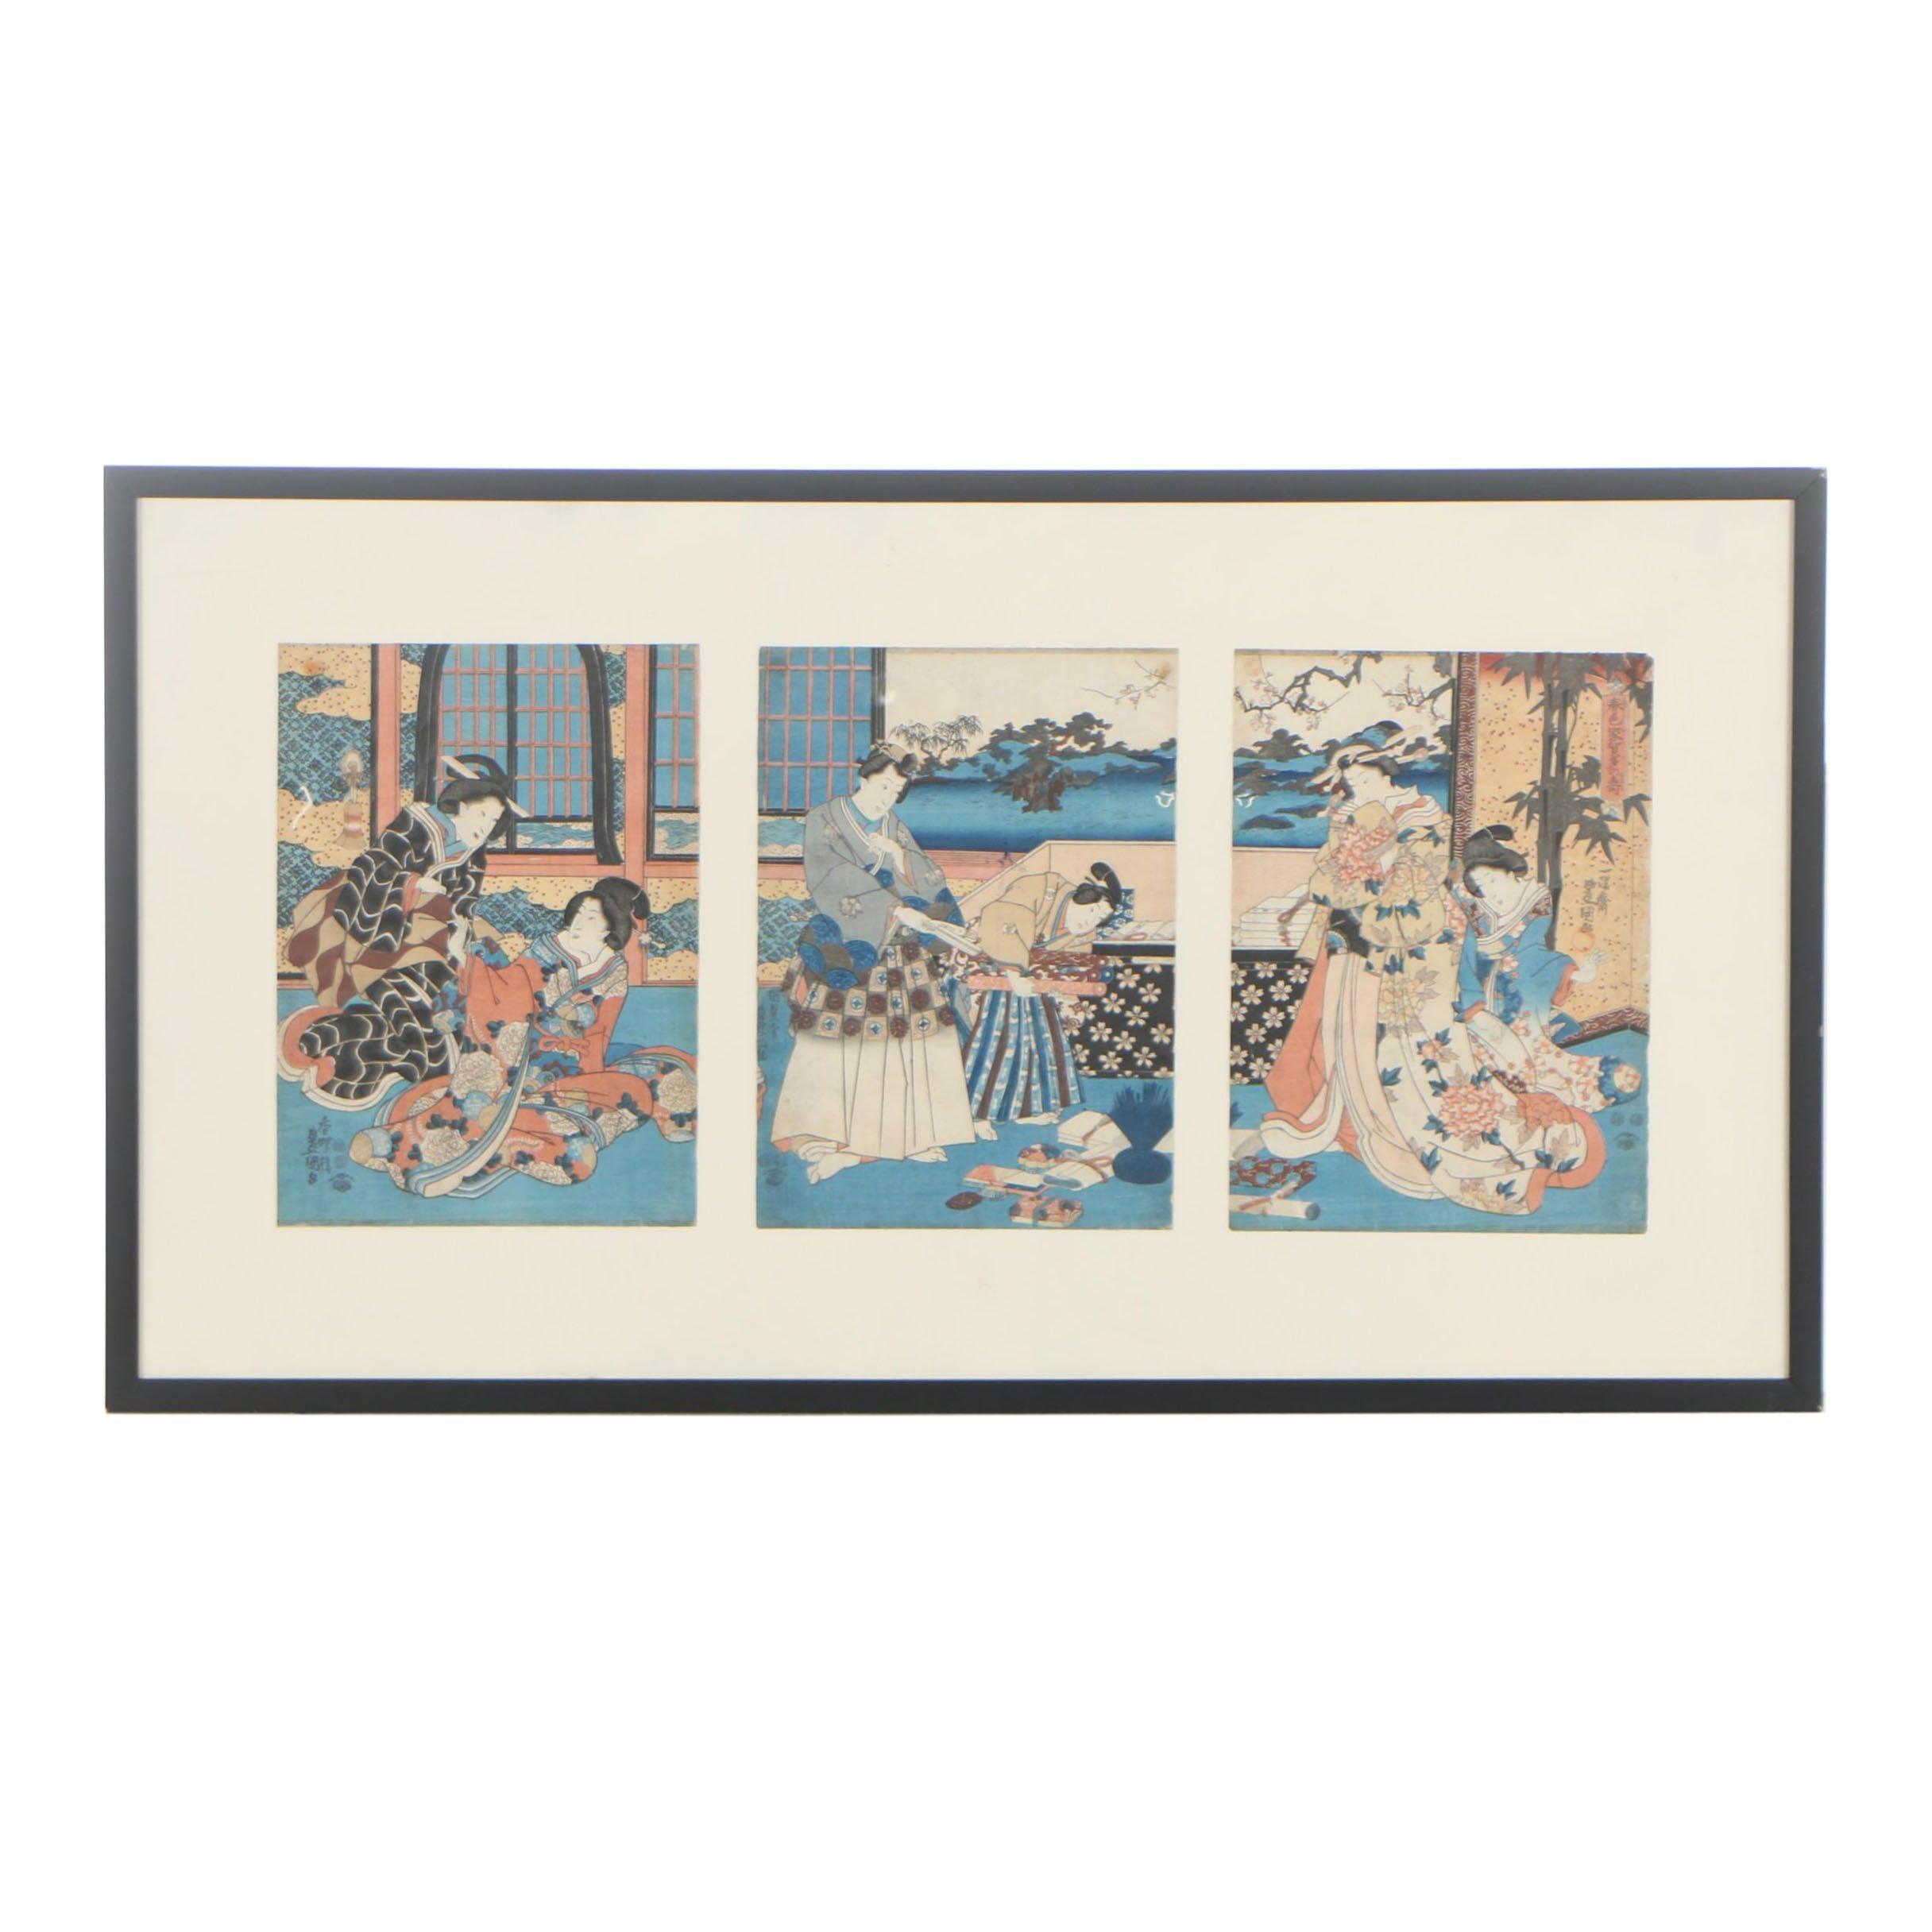 Utagawa Kunisada Woodblock Print Triptych